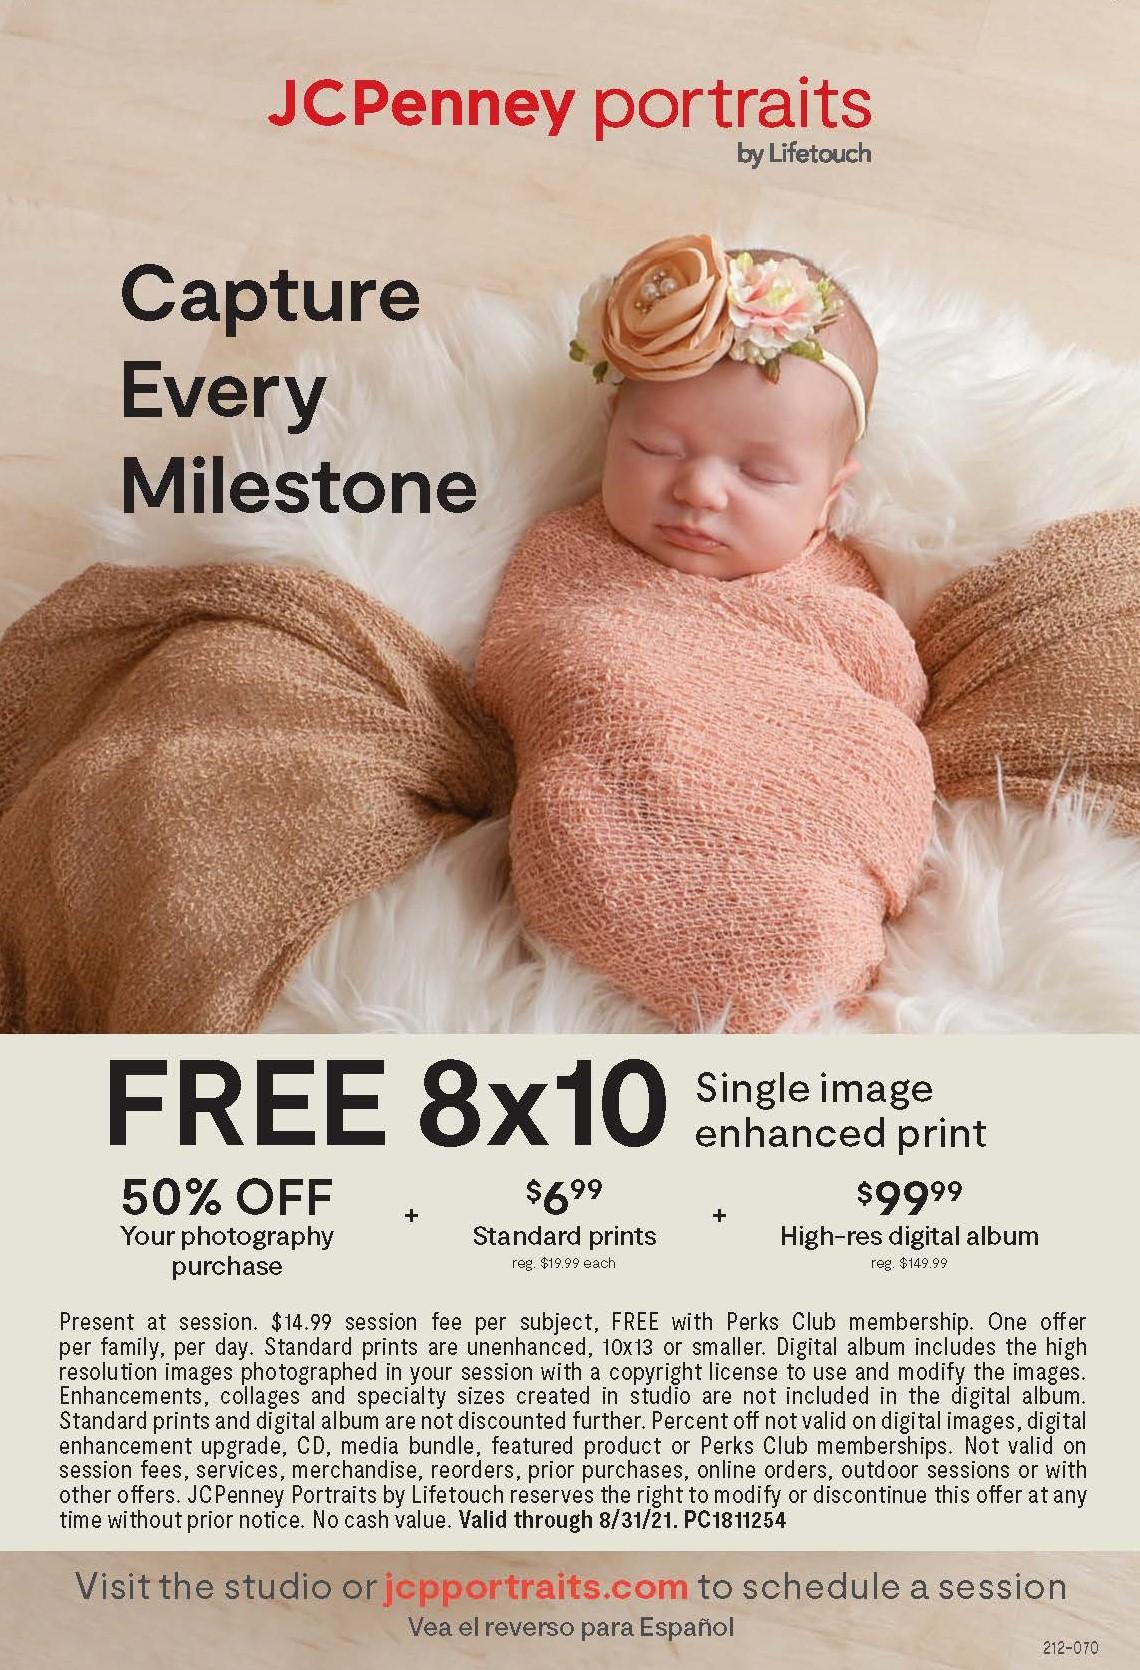 Free 8x10 Single Image